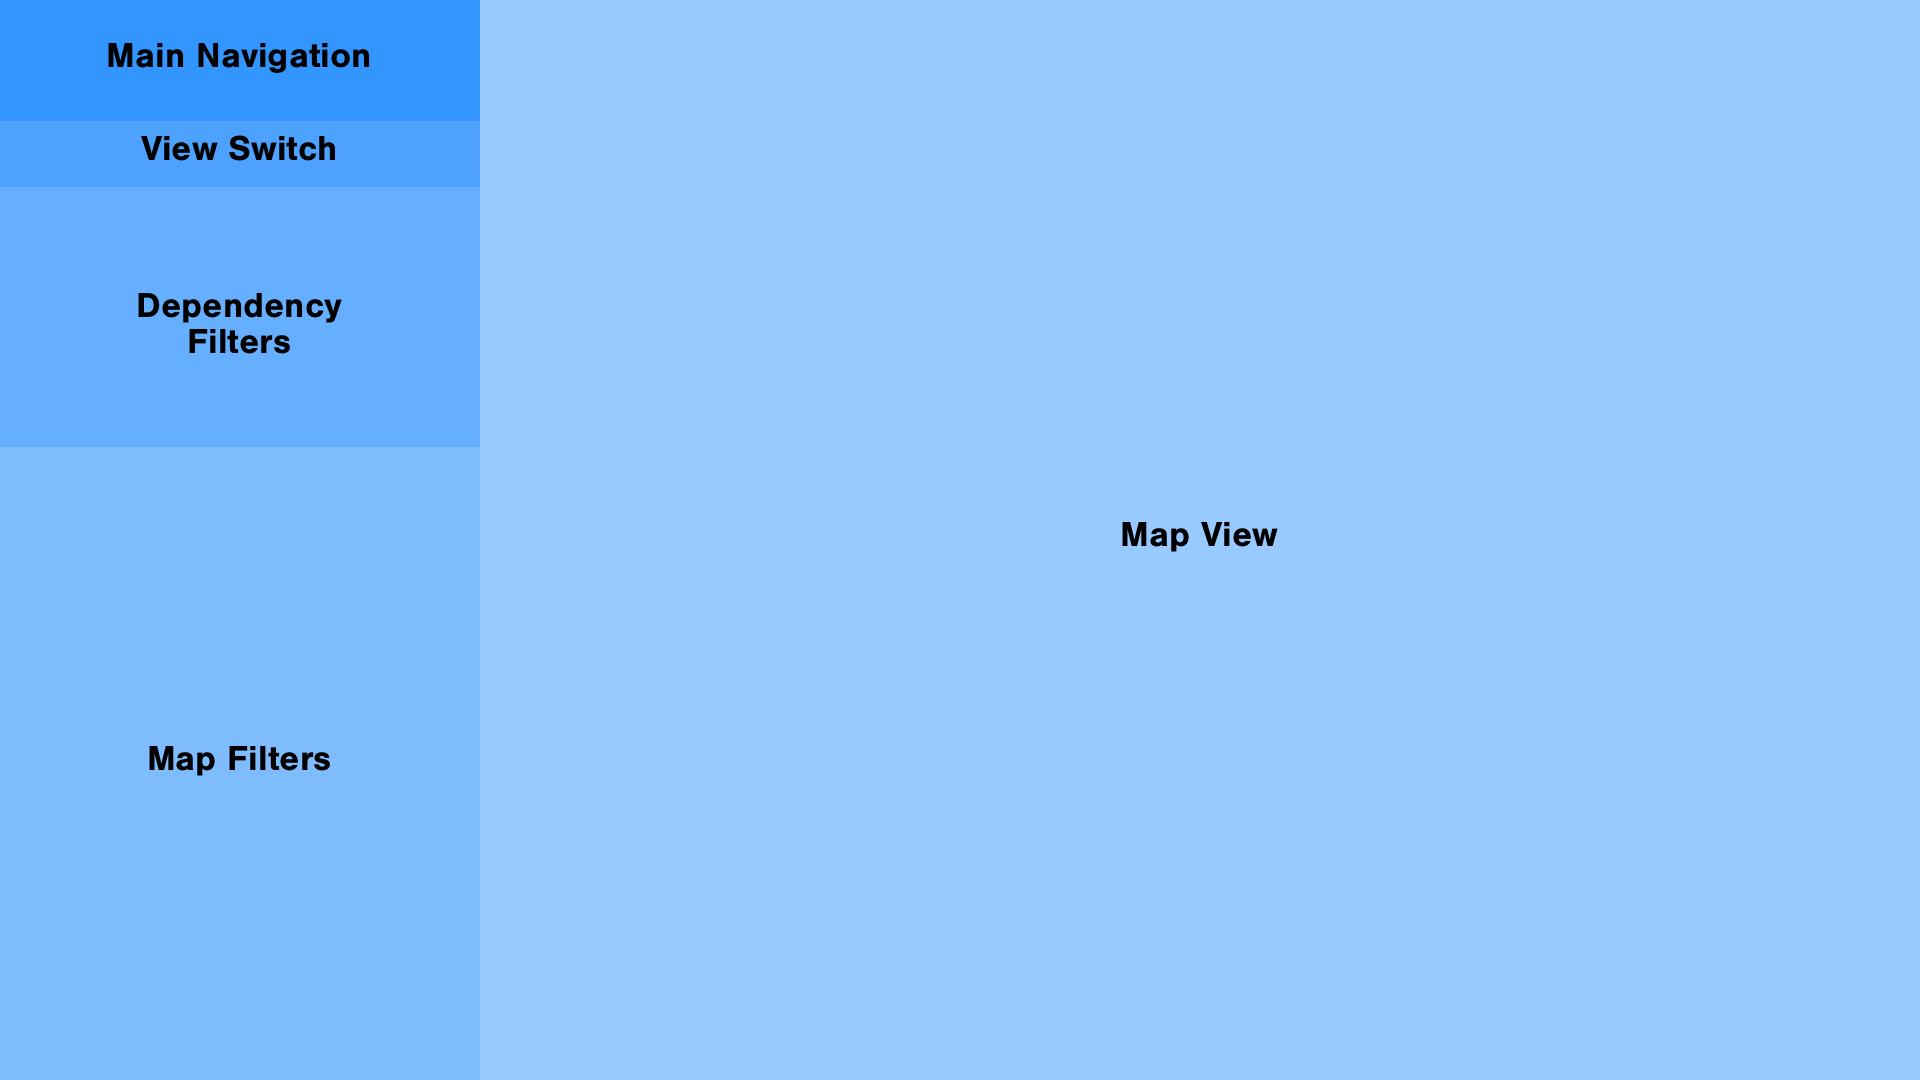 mapview1.jpg